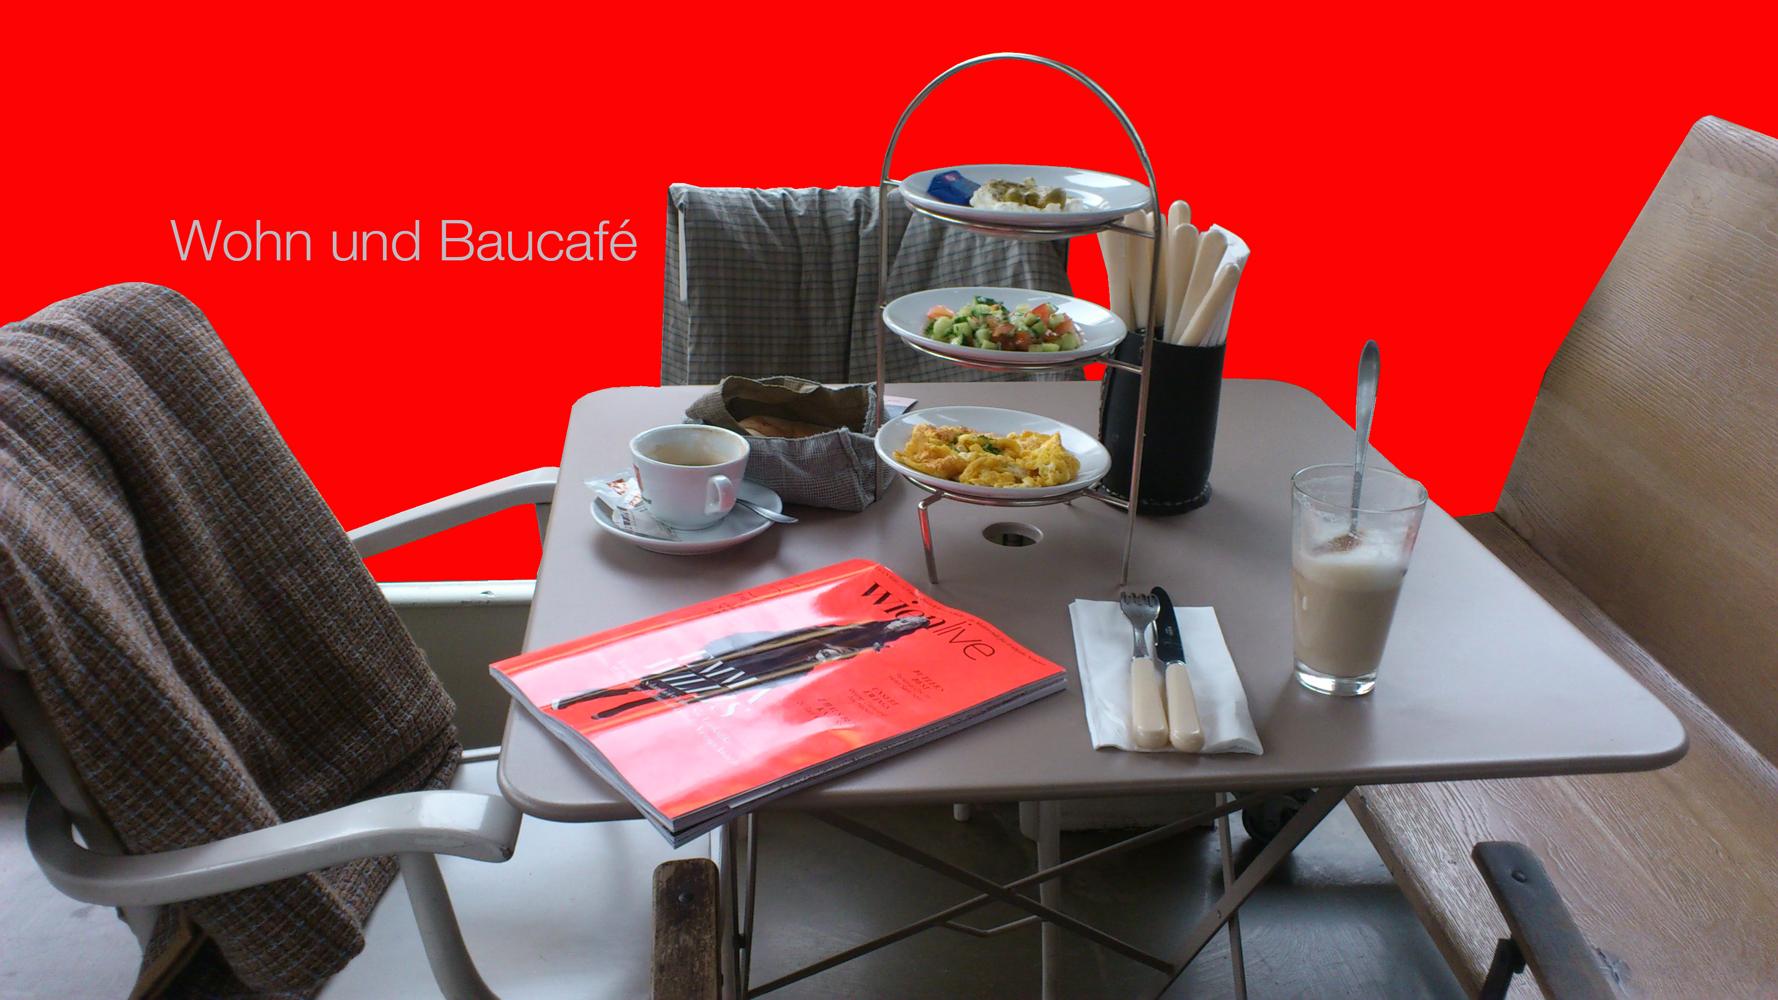 Baucafe 01